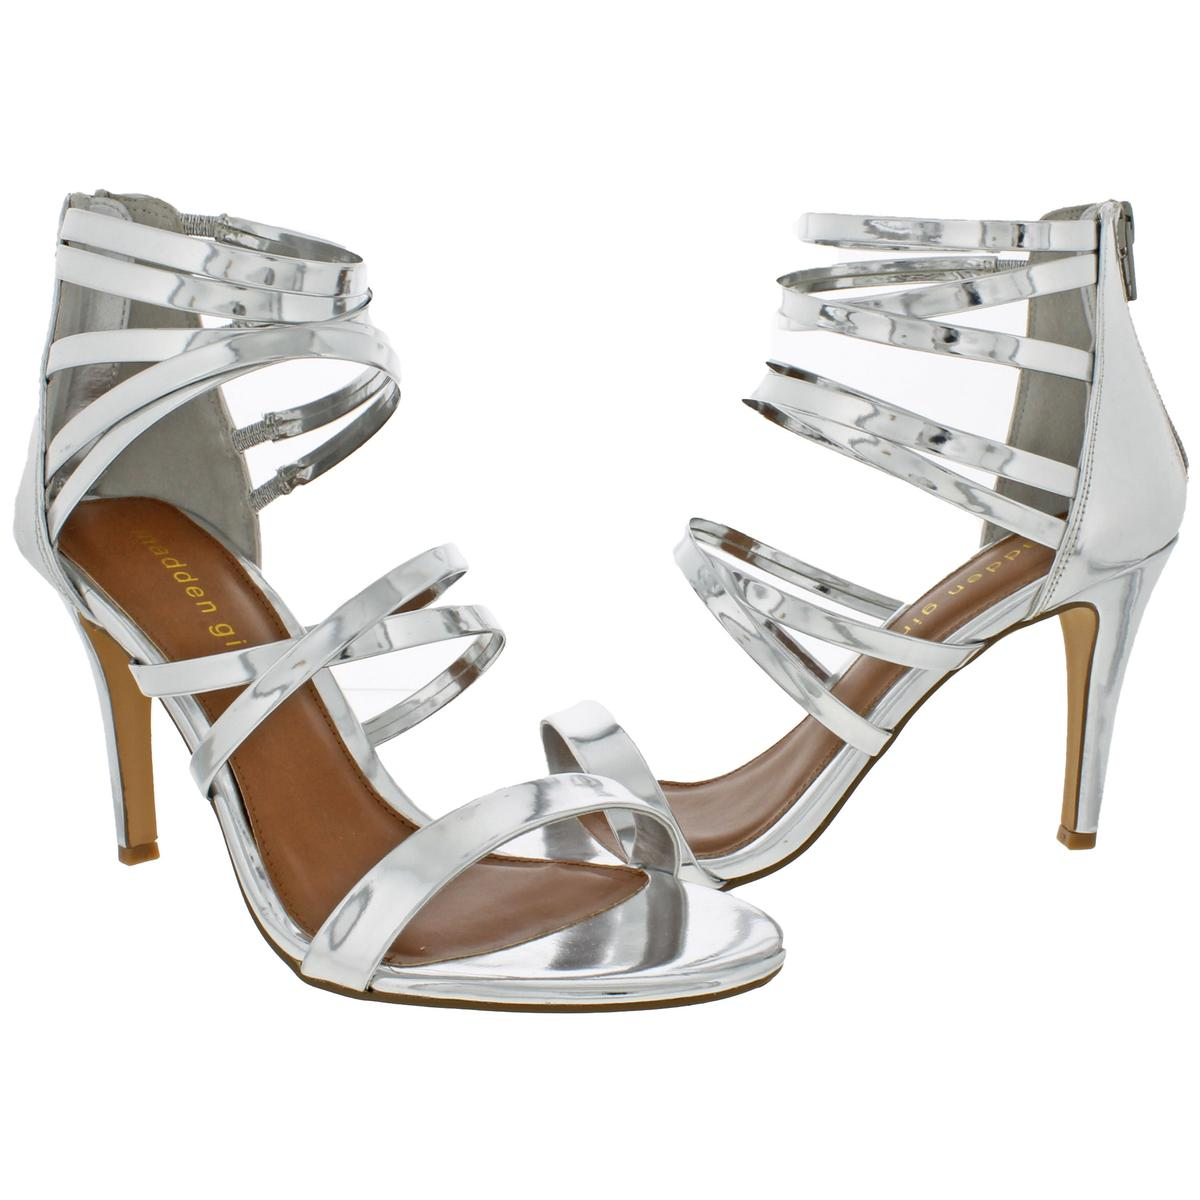 Madden-Girl-by-Steve-Madden-Womens-Babe-Metallic-Strappy-Sandals-Heels-BHFO-9082 thumbnail 5